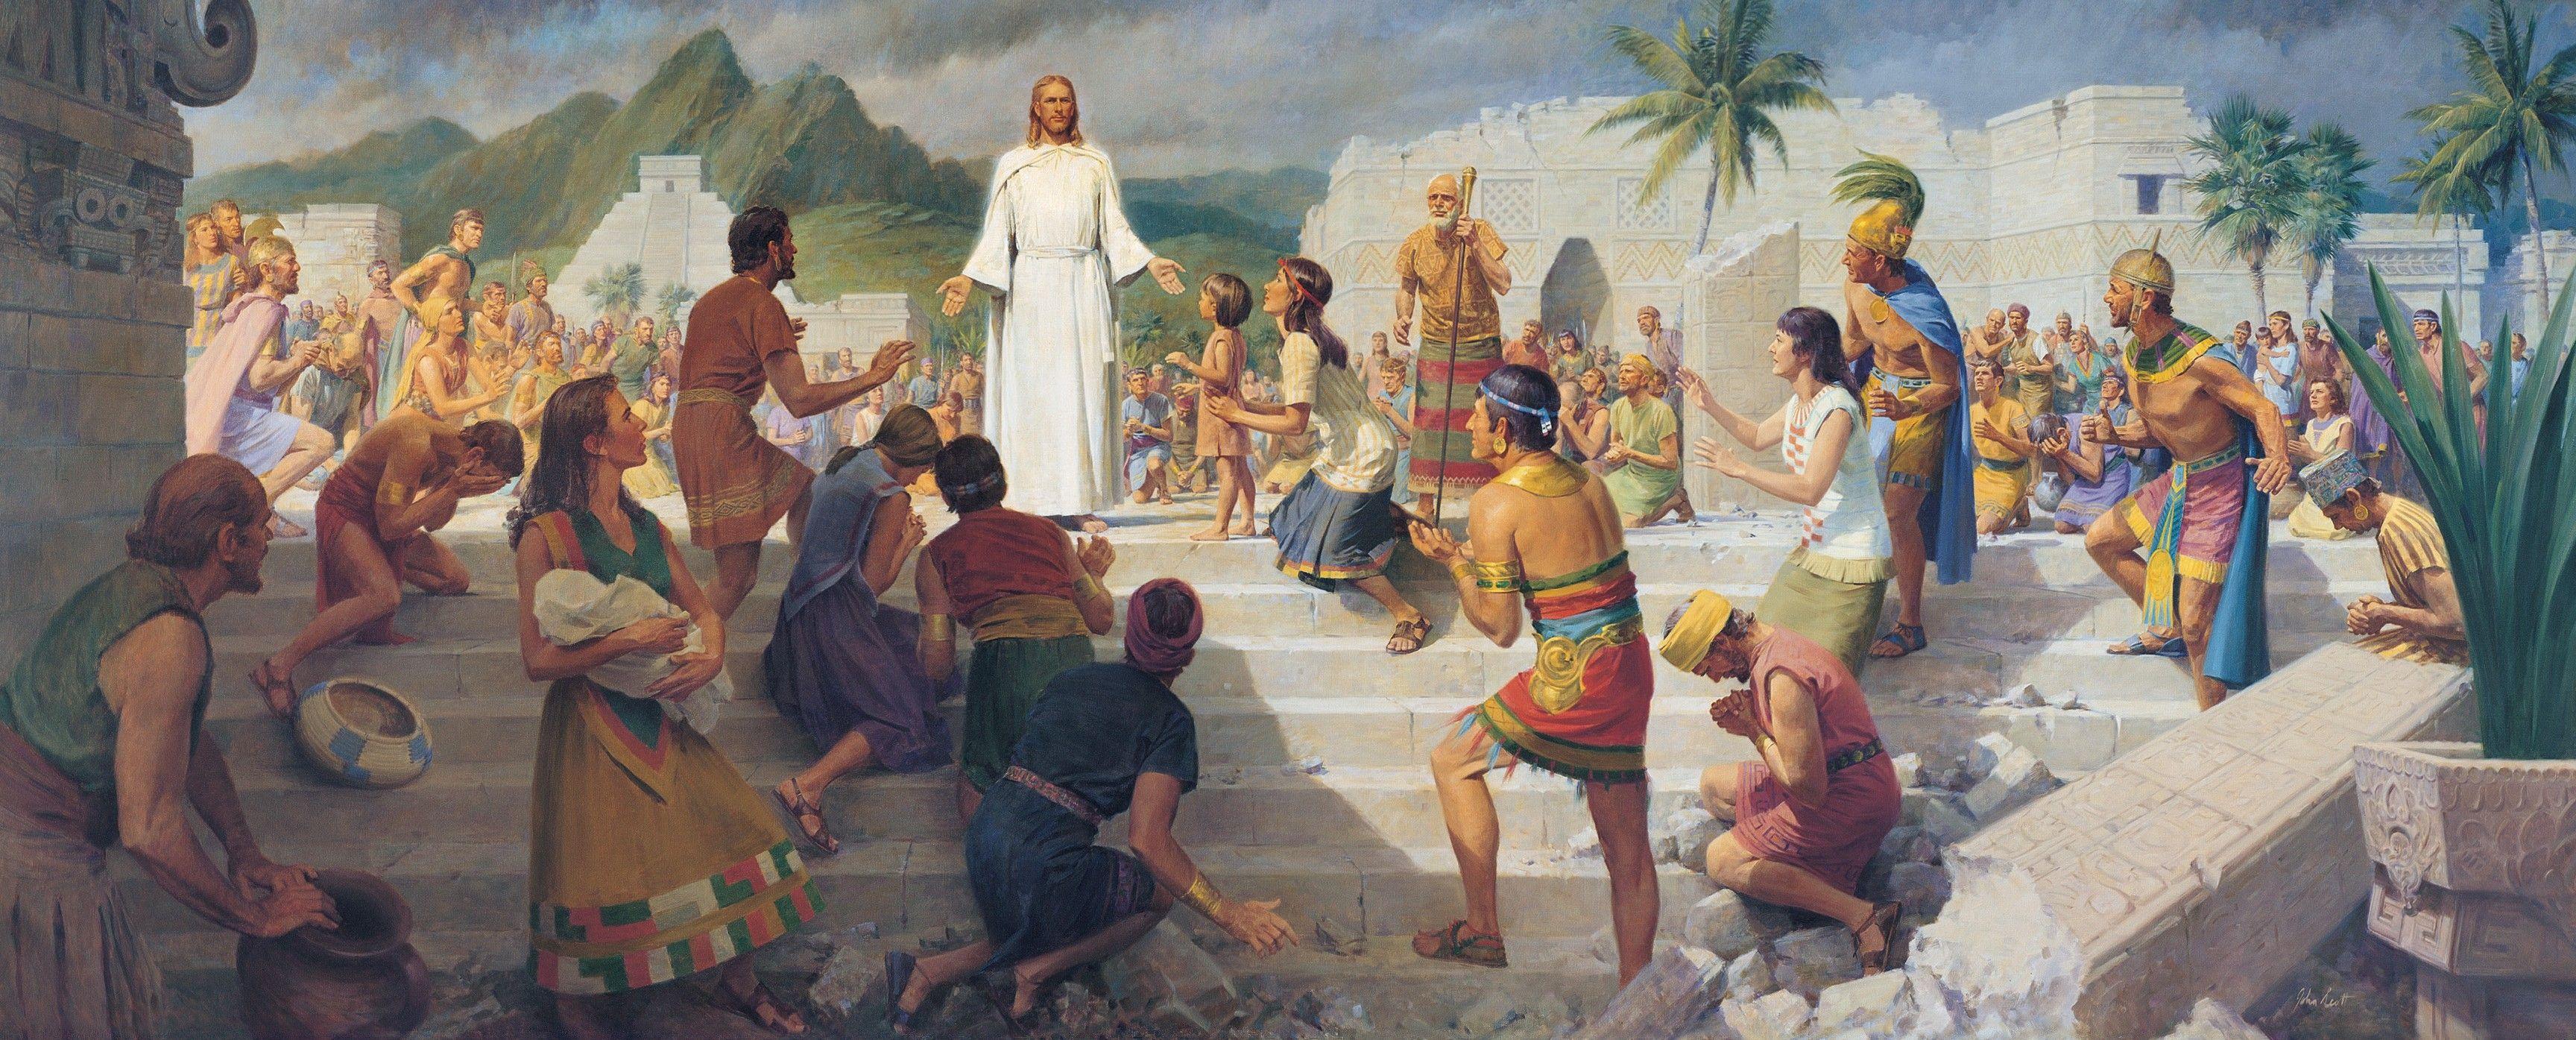 Jesus Teaching in the Western Hemisphere (Jesus Christ Visits the Americas), by John Scott (62380); GAK 316; GAB 82; Primary manual 1-44; Primary manual 3-17; Primary manual 4-45; 3 Nephi 11:8–41; 12:12–26